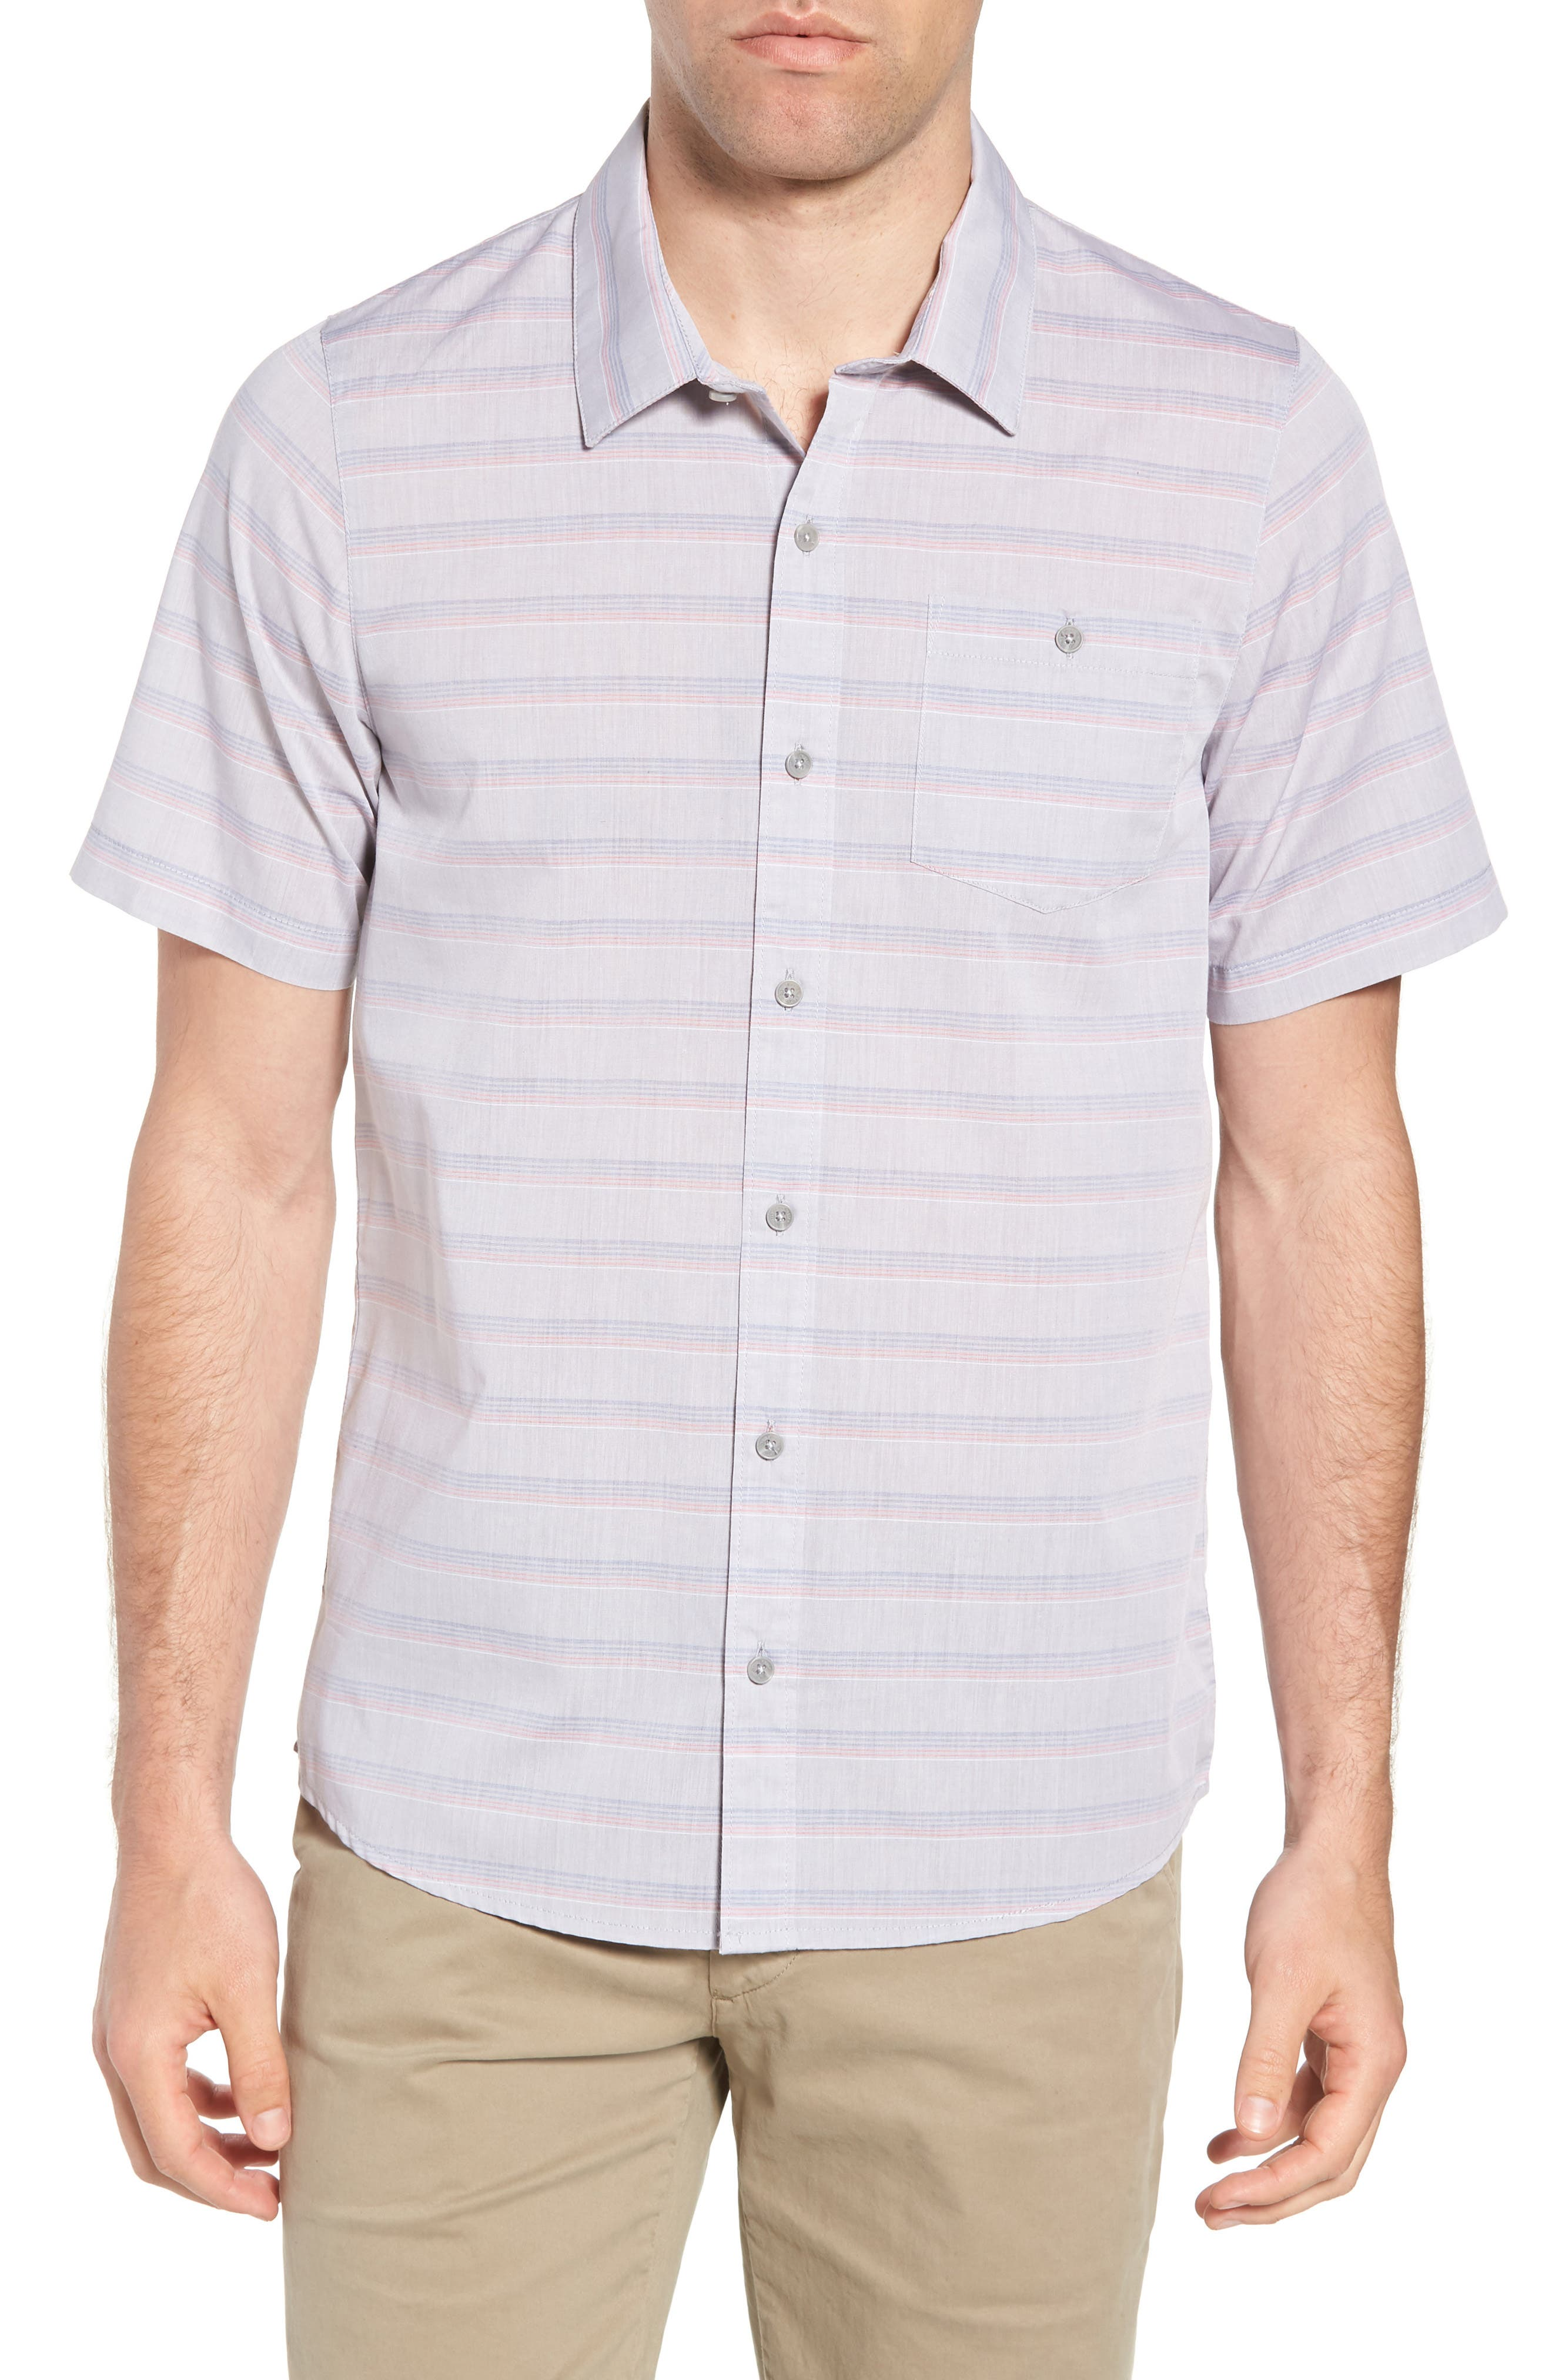 Comet Regular Fit Short Sleeve Sport Shirt,                         Main,                         color, 020